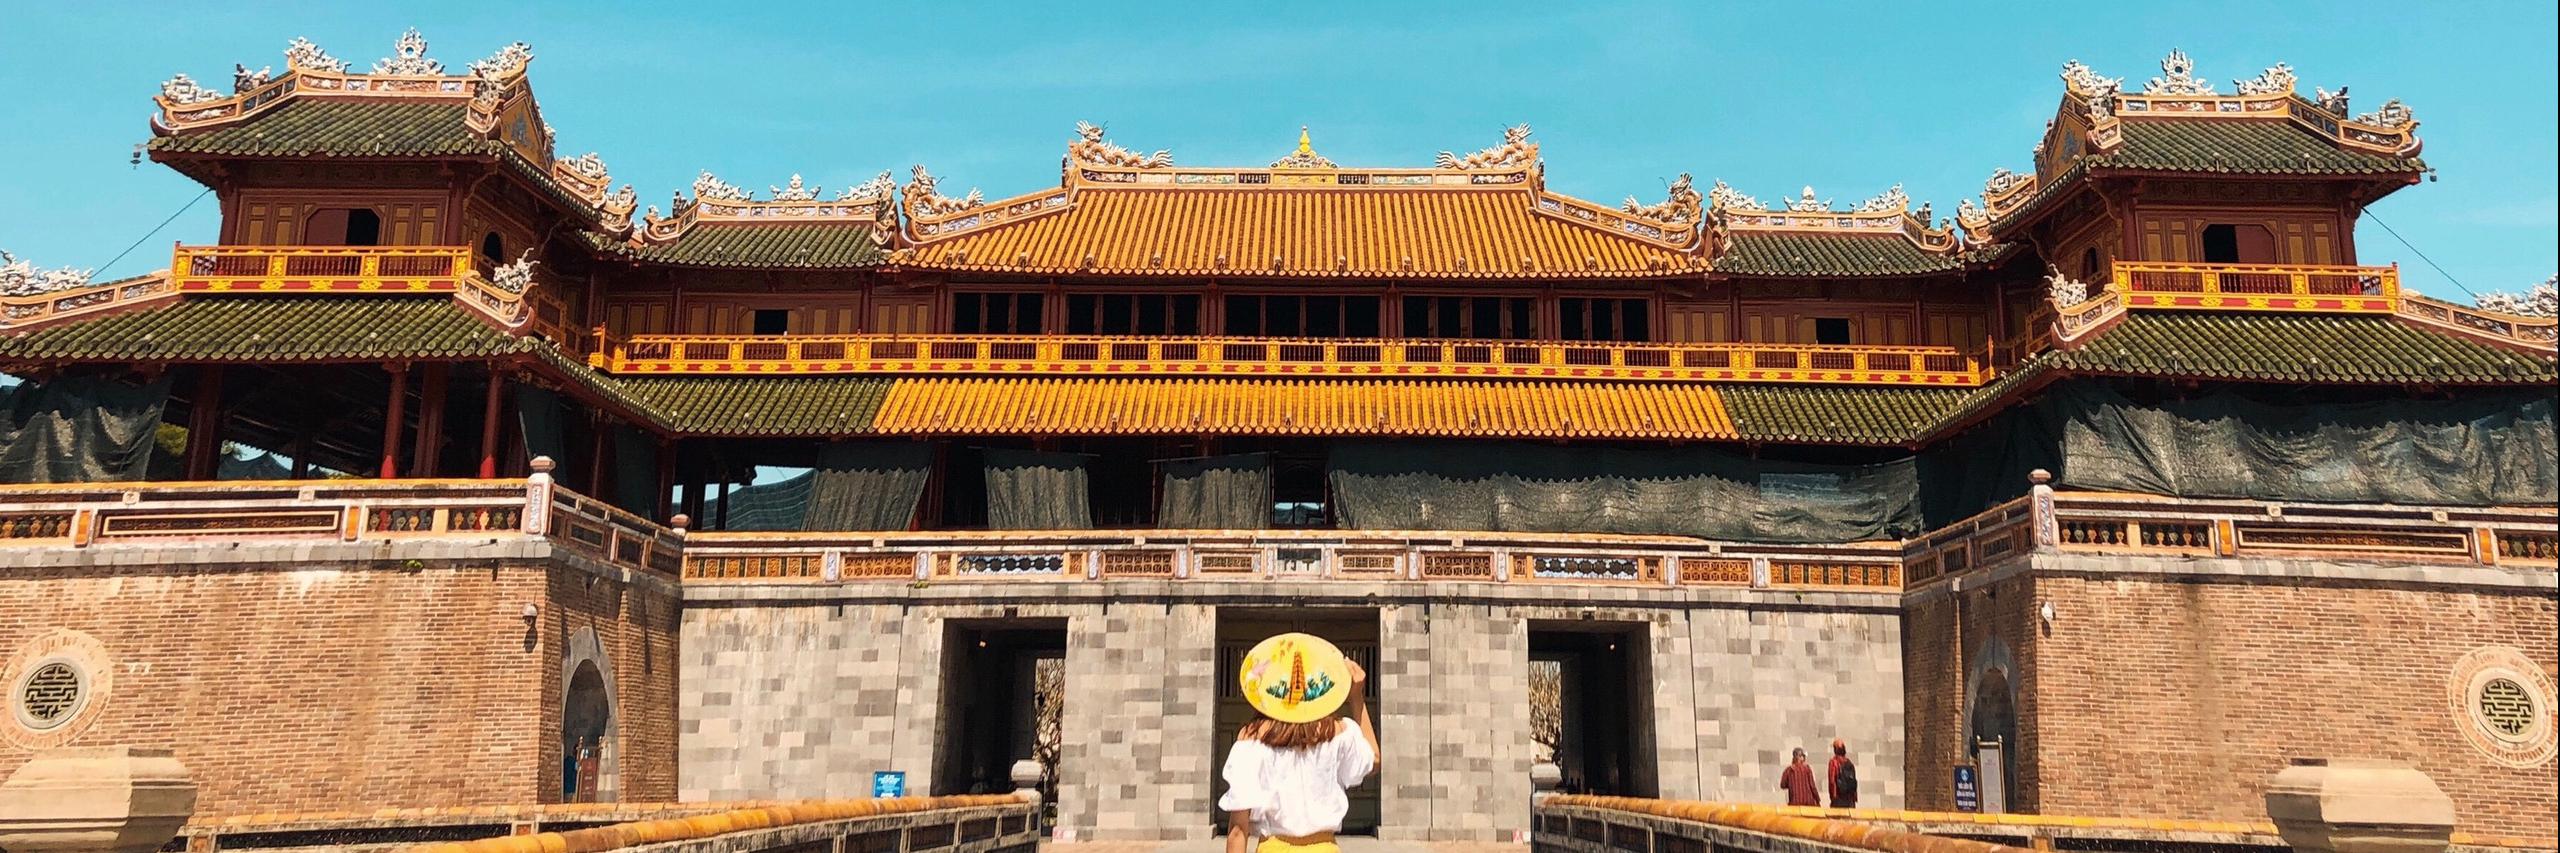 https://gody.vn/blog/nhanma2711979771/post/thuong-mot-xu-hue-6472